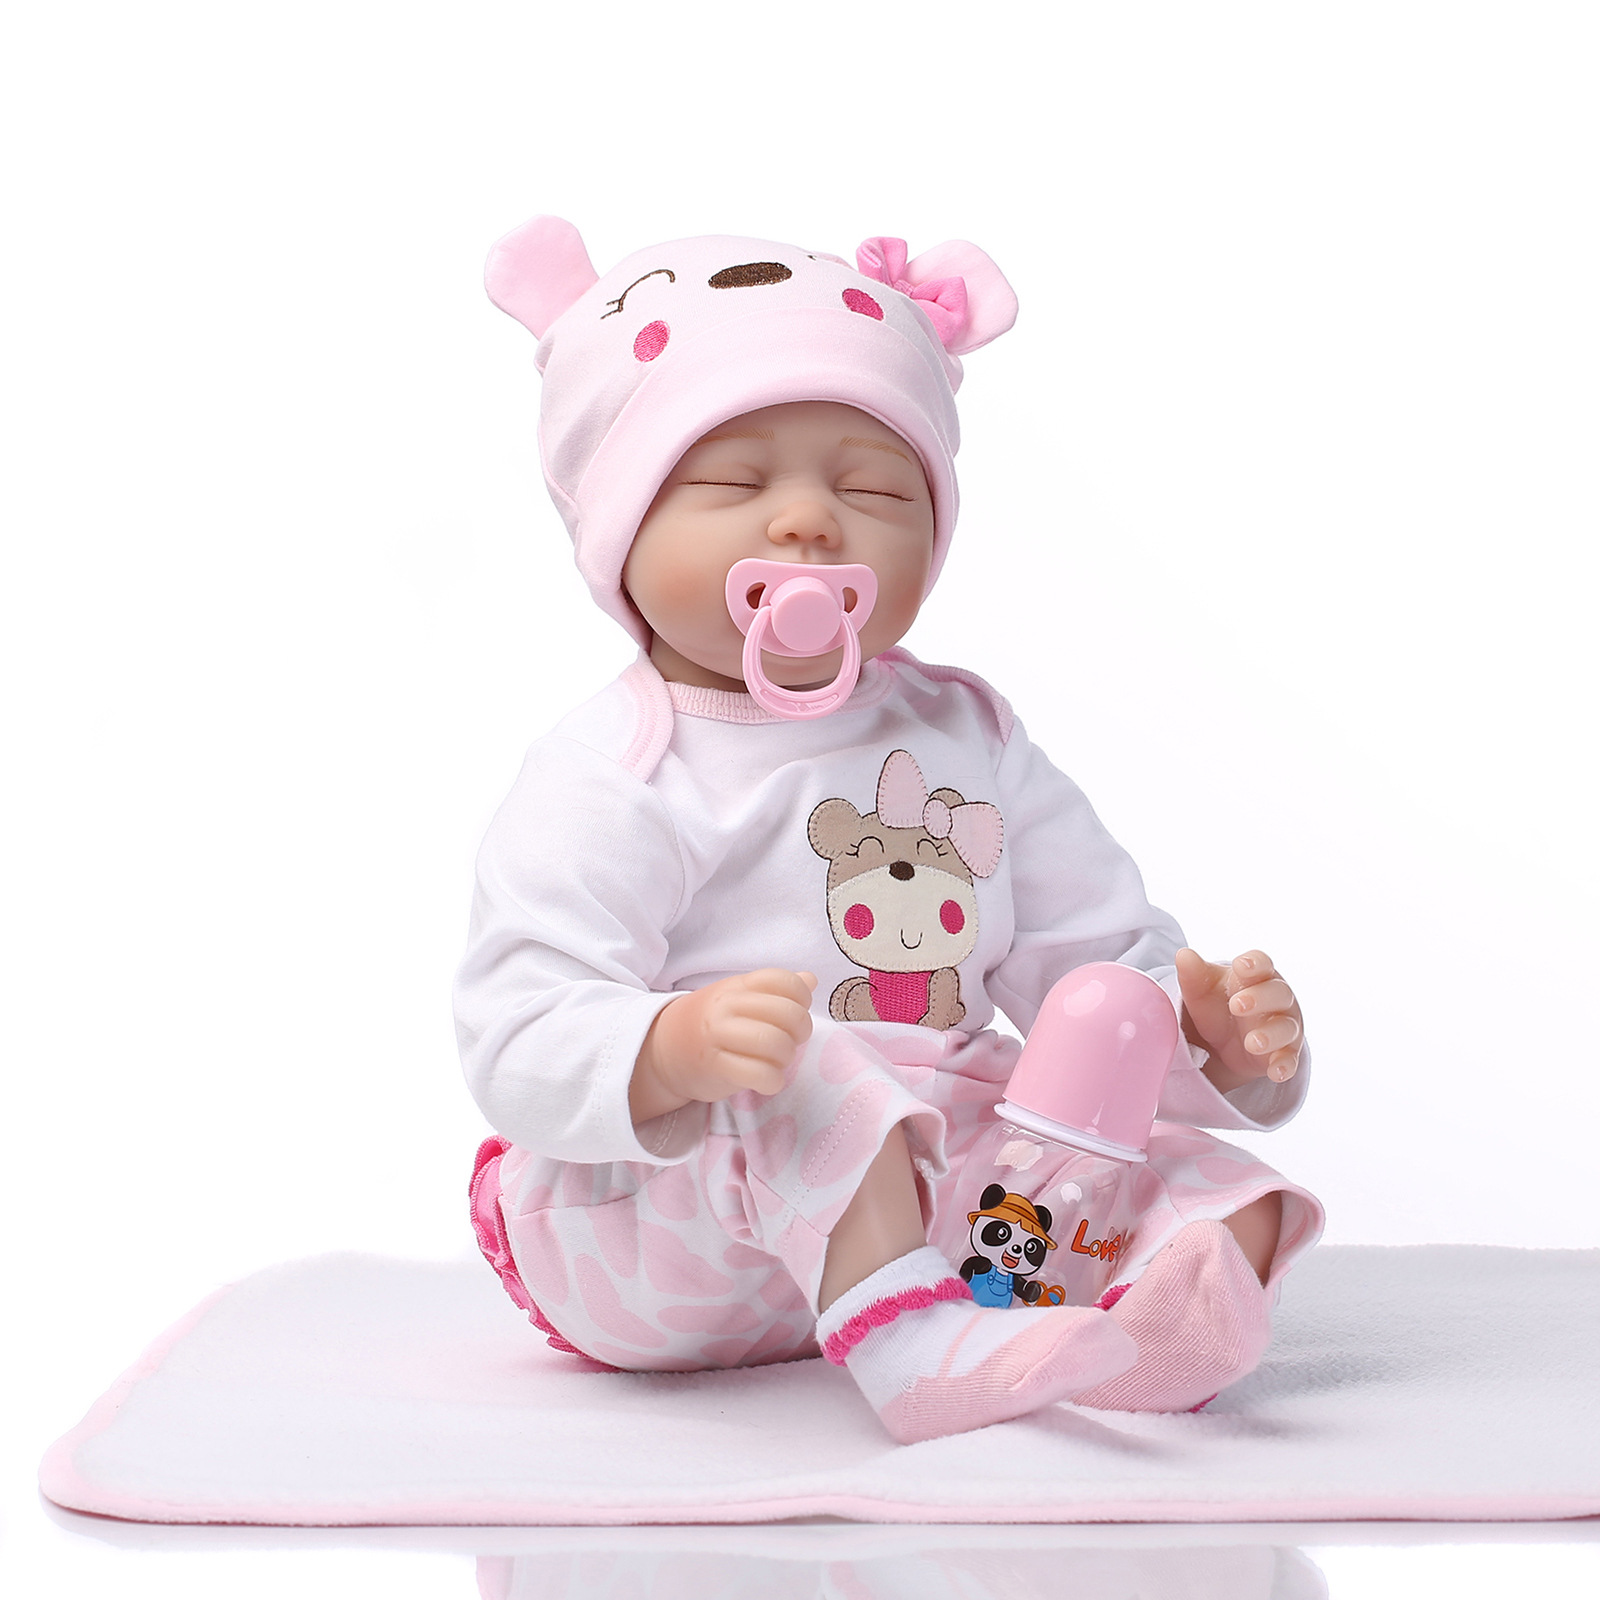 NPK Brand Genuine Product Model Rebirth Infant Doll Supply of Goods